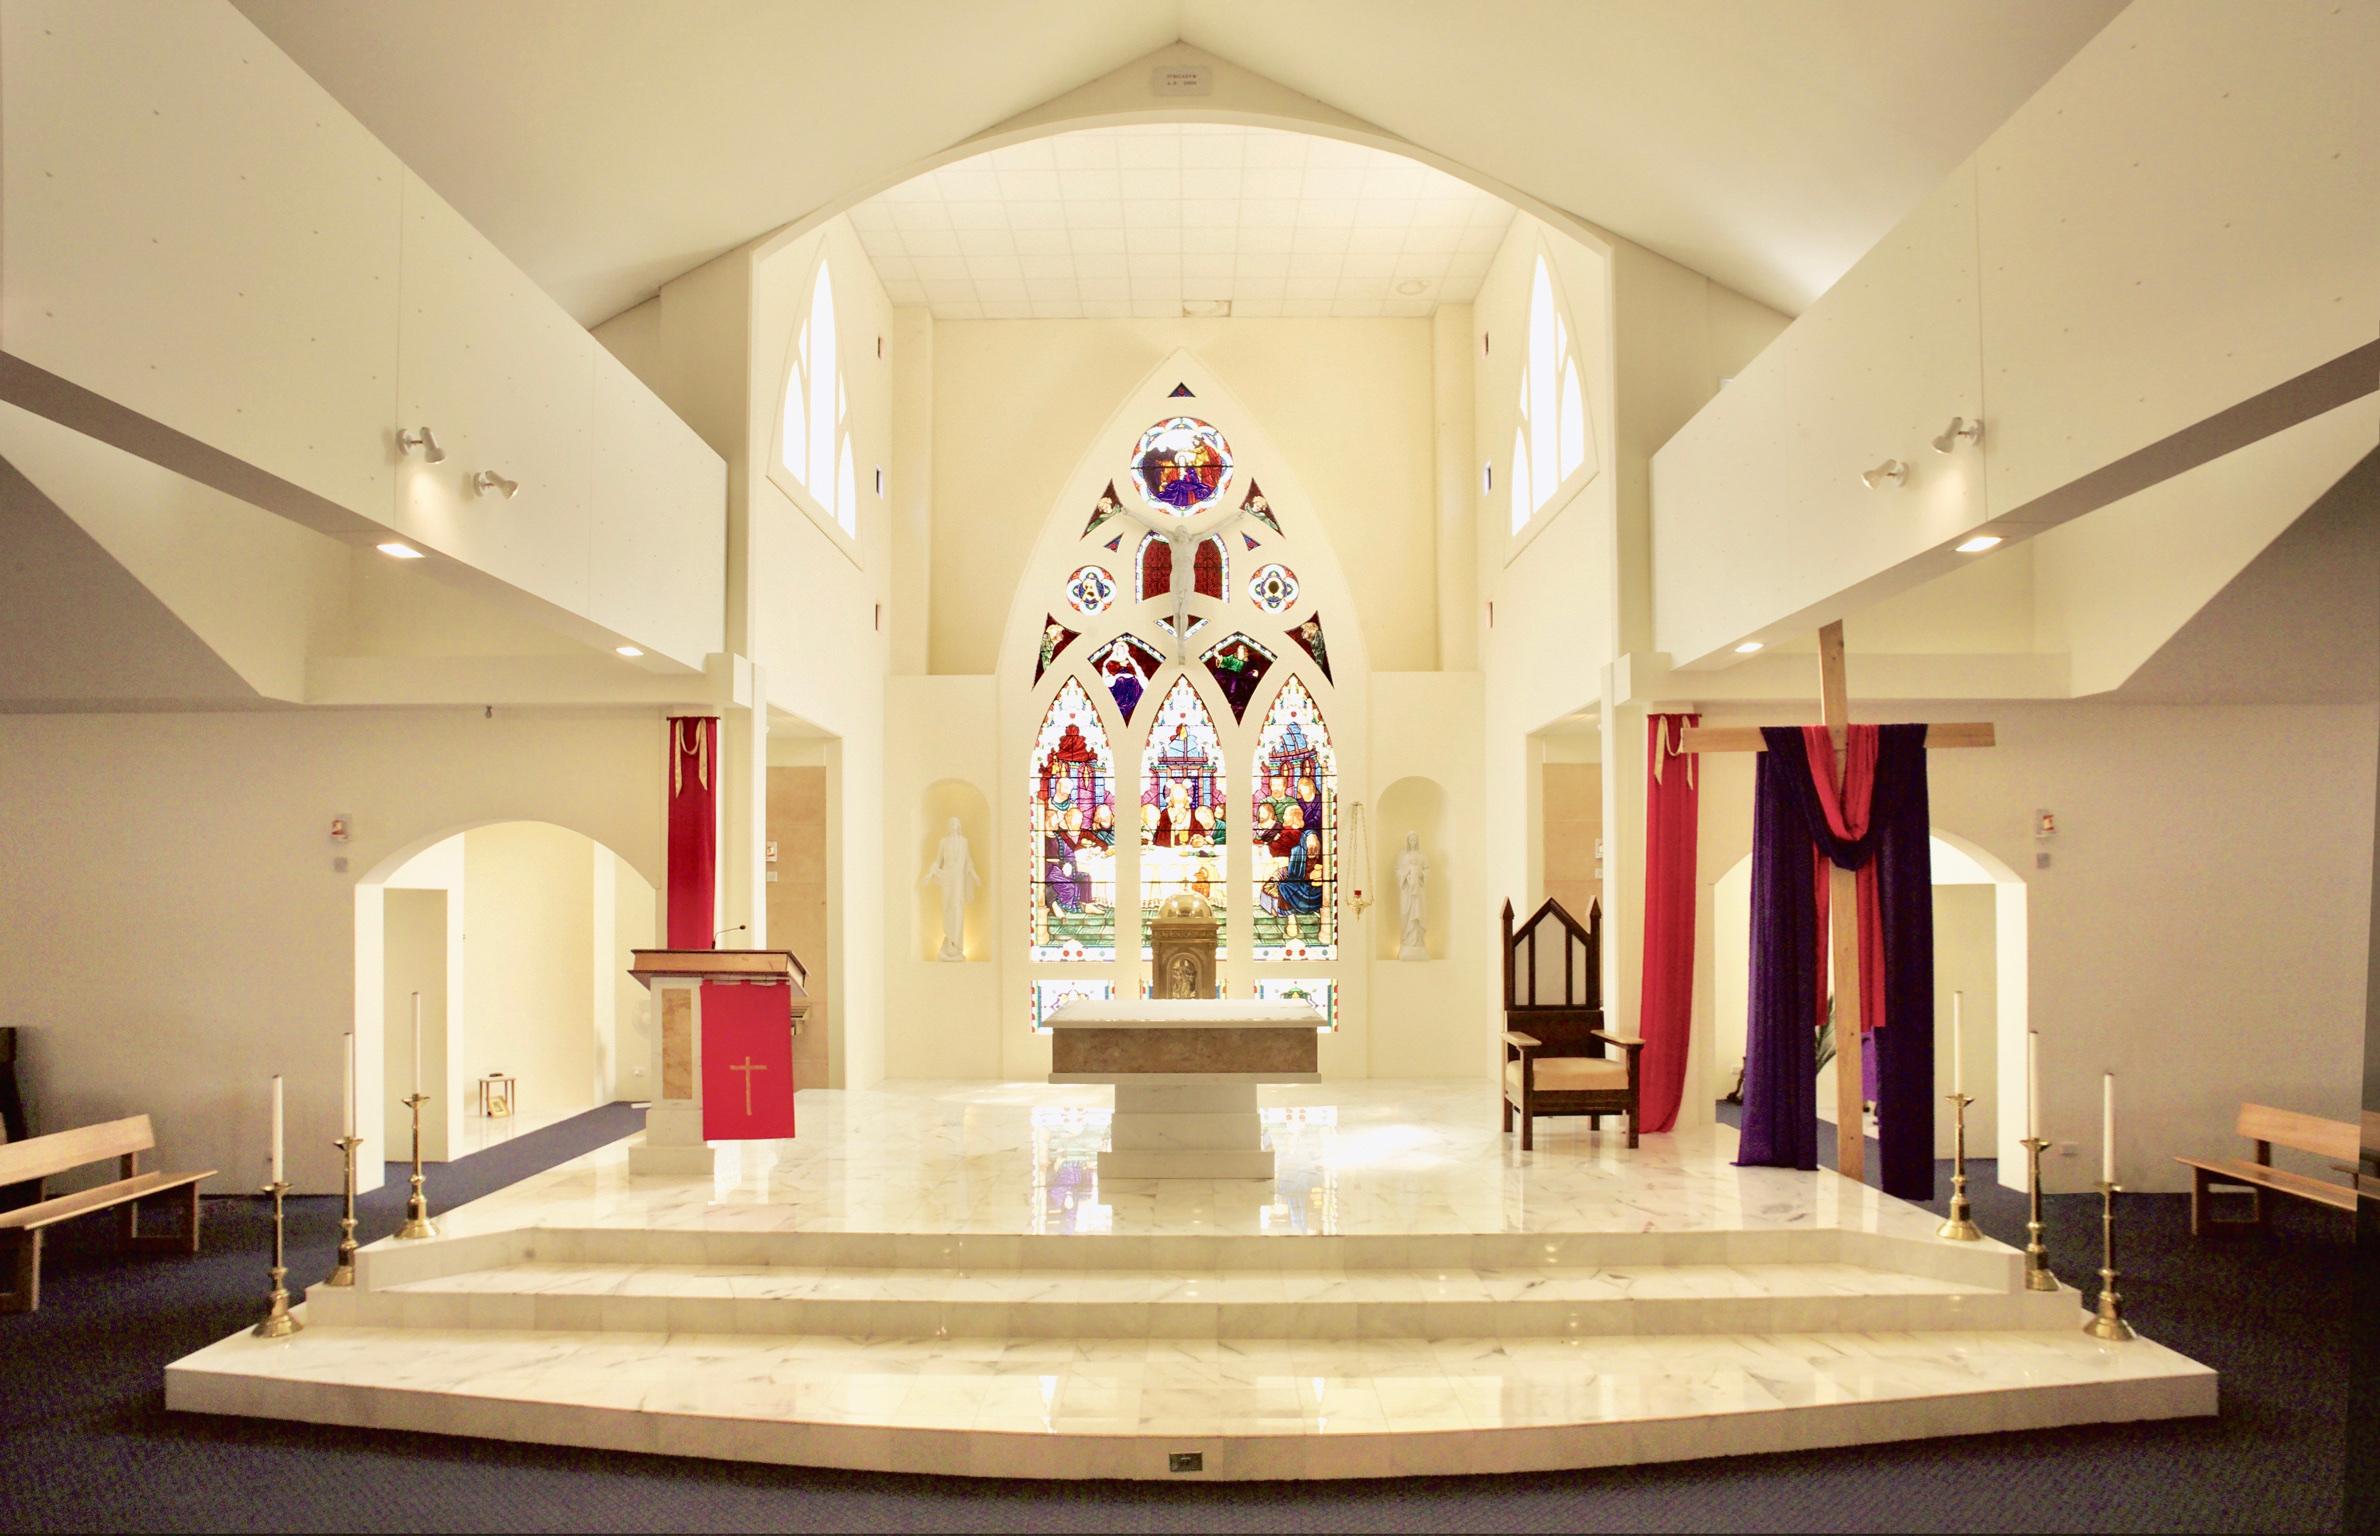 MEDIUM CHURCH INT.jpg